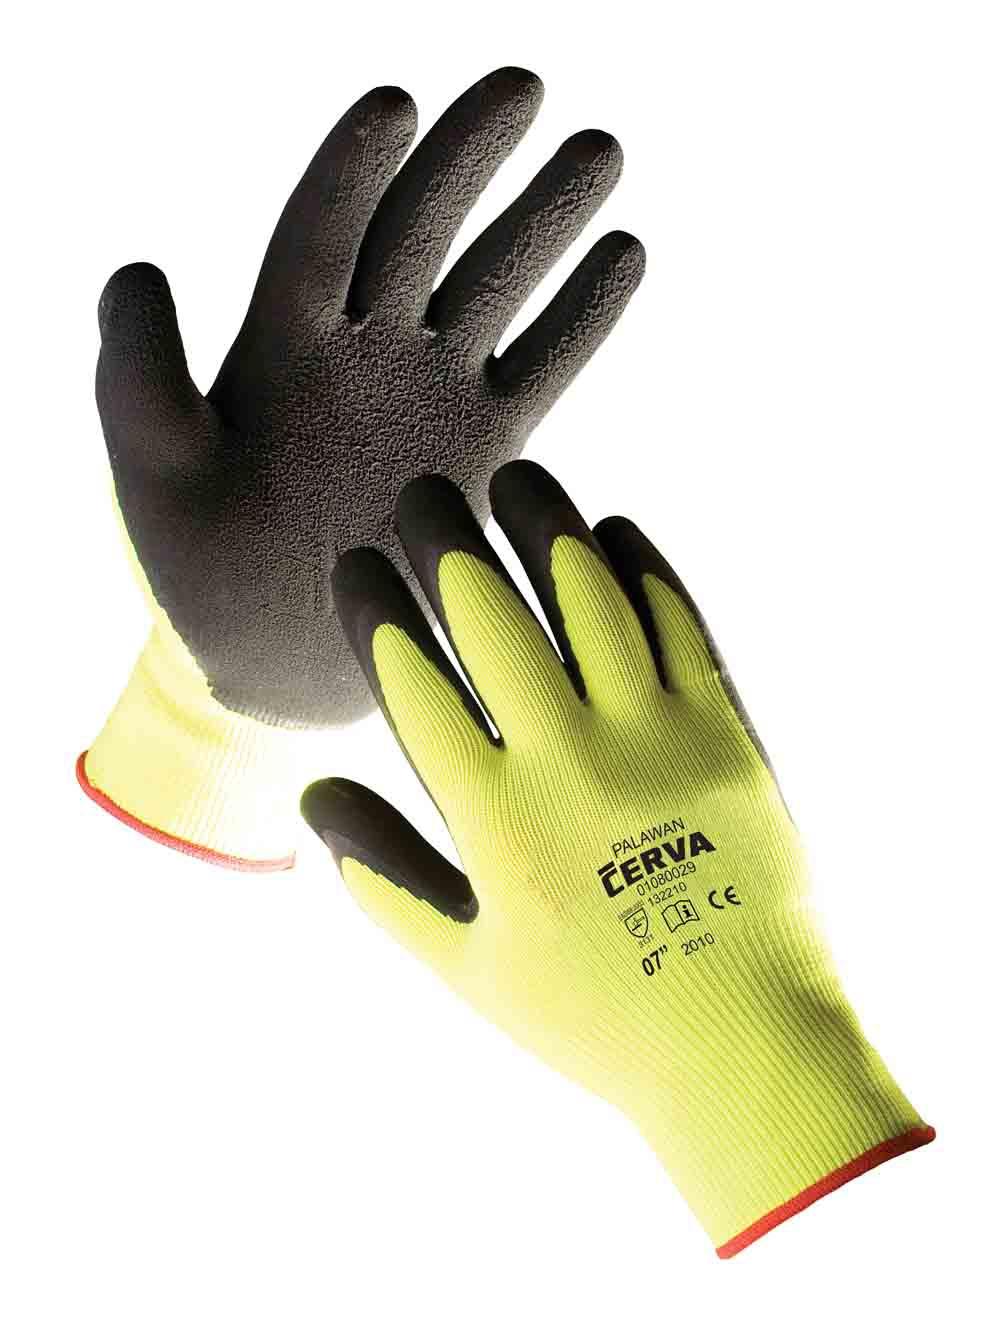 PALAWAN rukavice nylon. late dlaň - 10